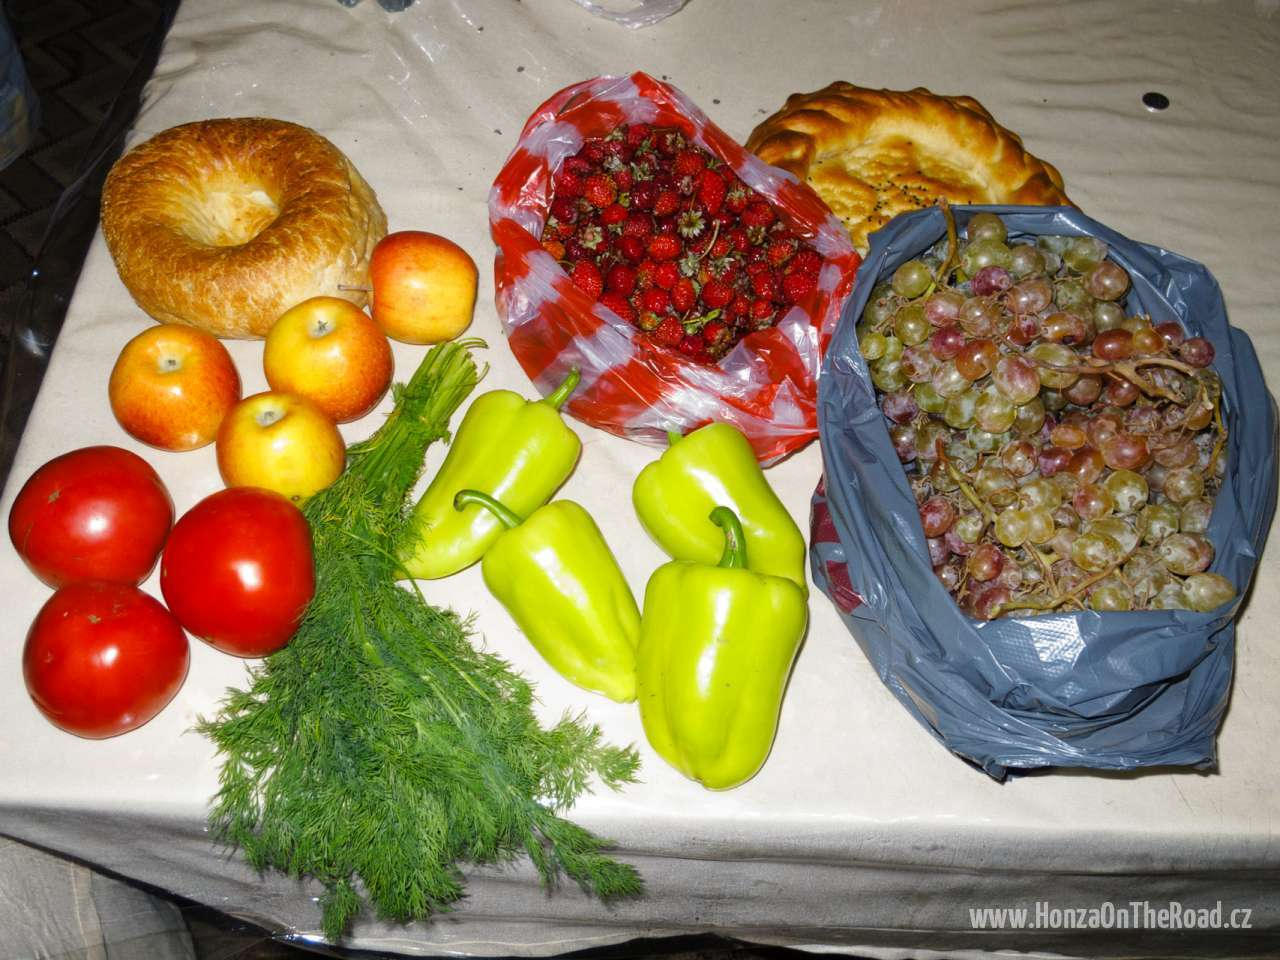 Kyrgyzstán, Nákup z trhu - Kyrgyzstan, Shopped at a market